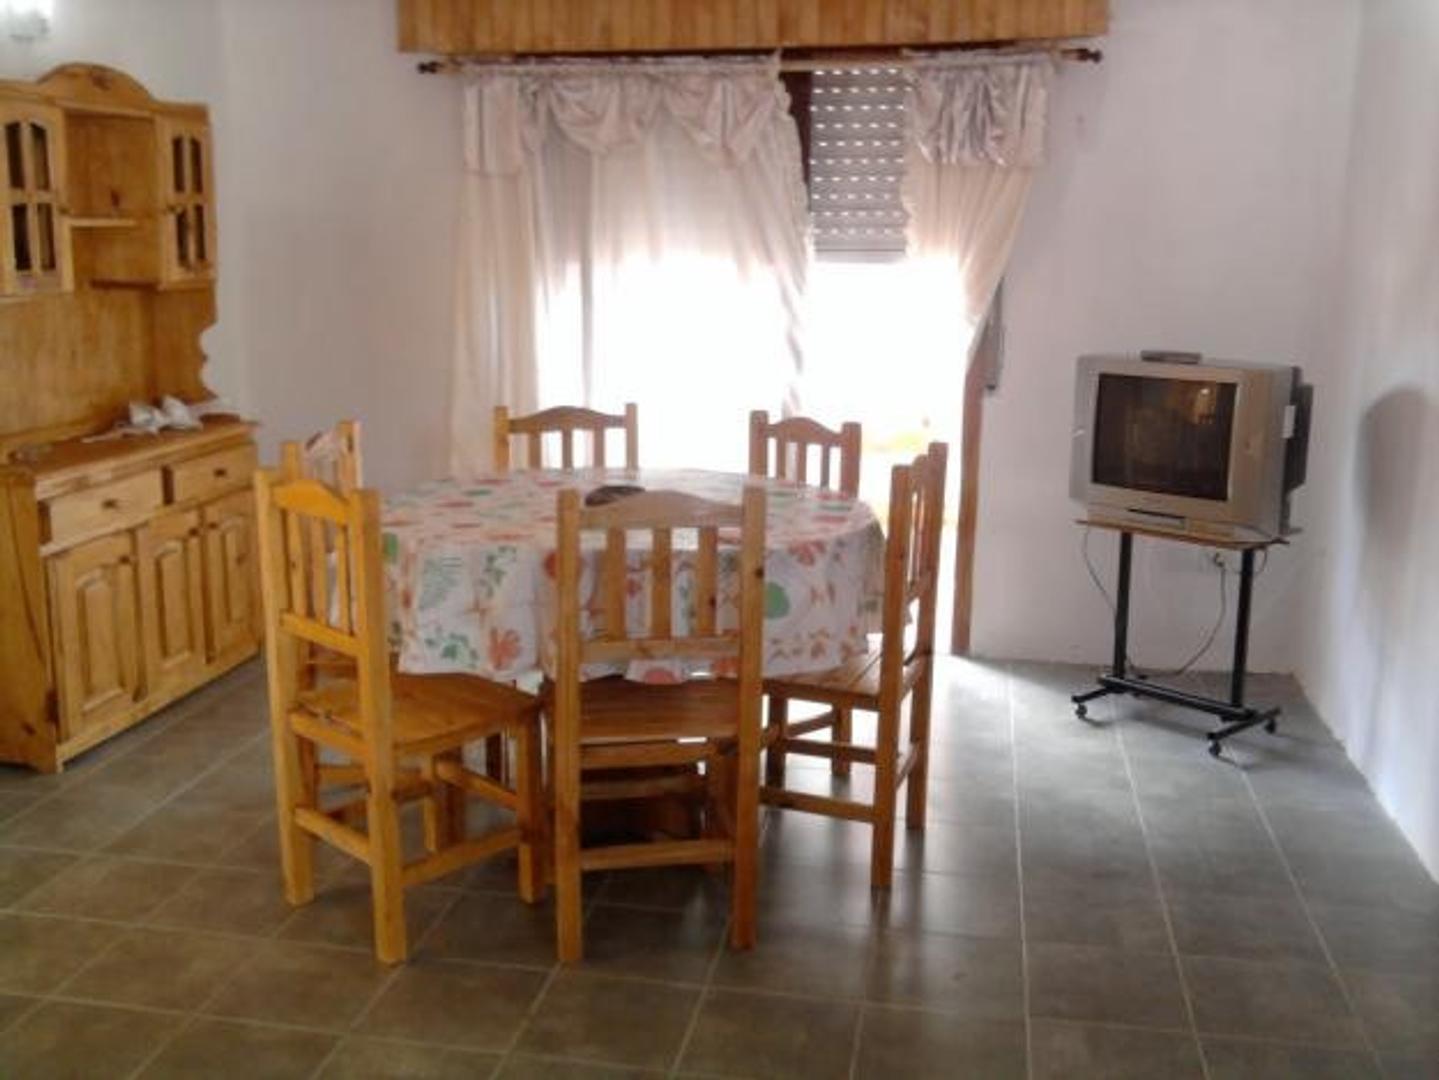 Alquiler en villa gesell verano 2019